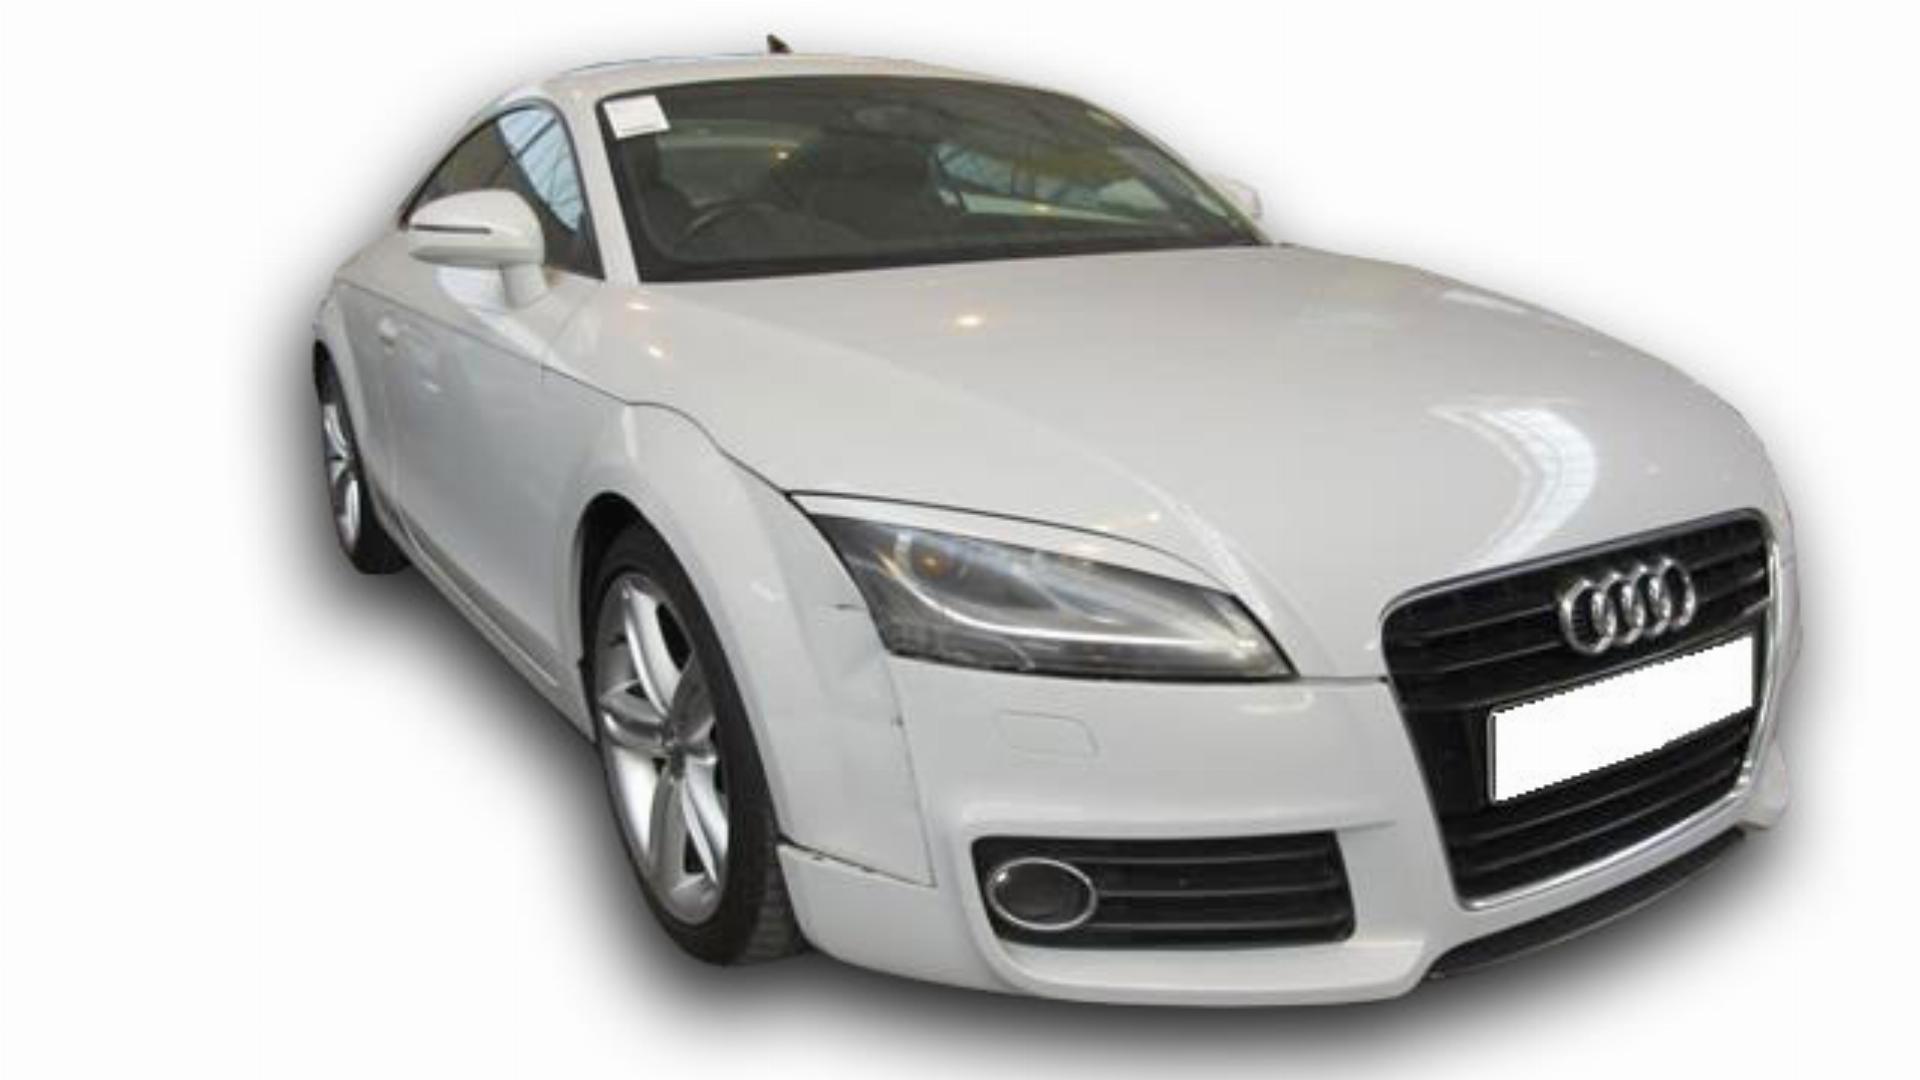 Audi TT 2.0T Fsi Coupe Stronic